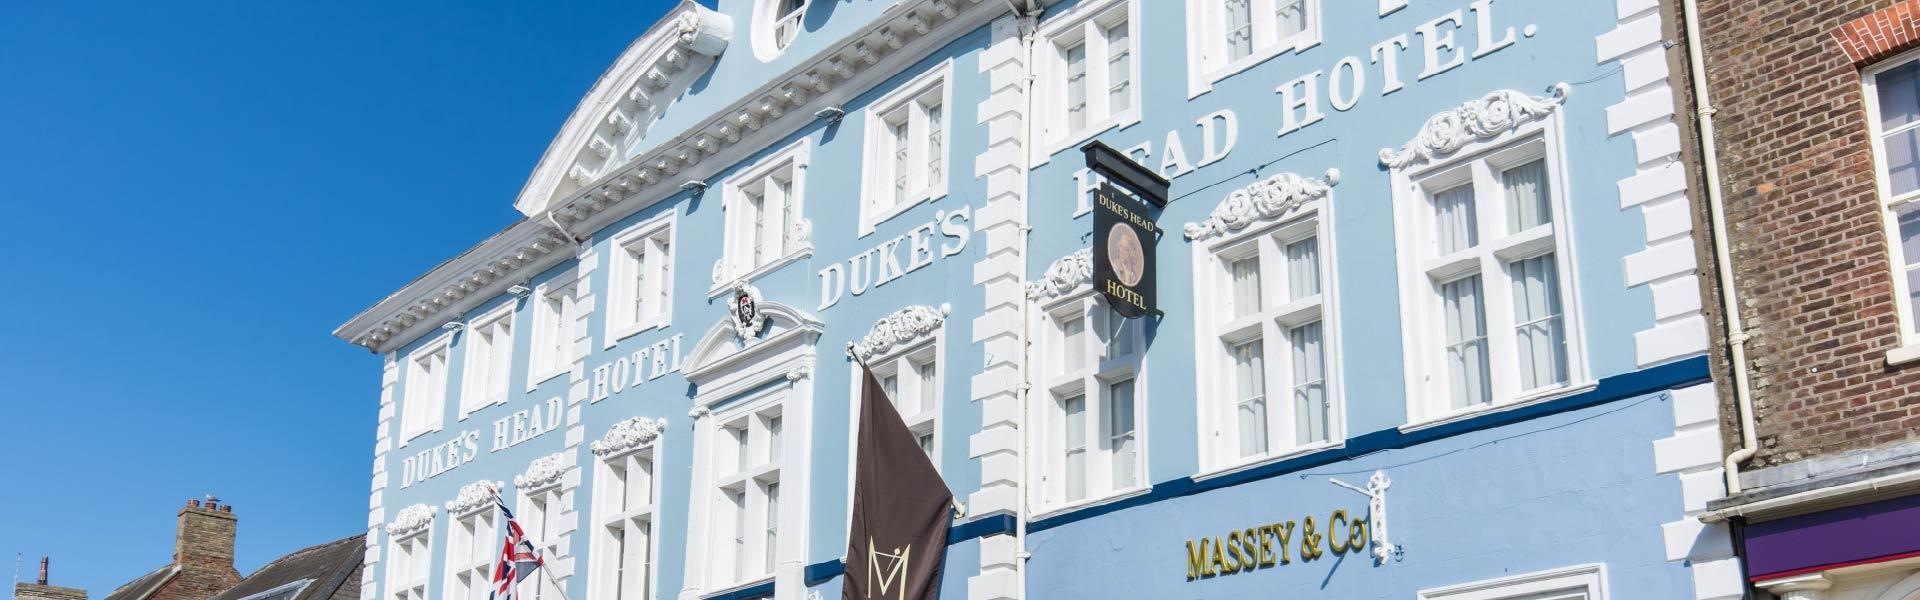 The Dukes Head Hotel King's Lynn